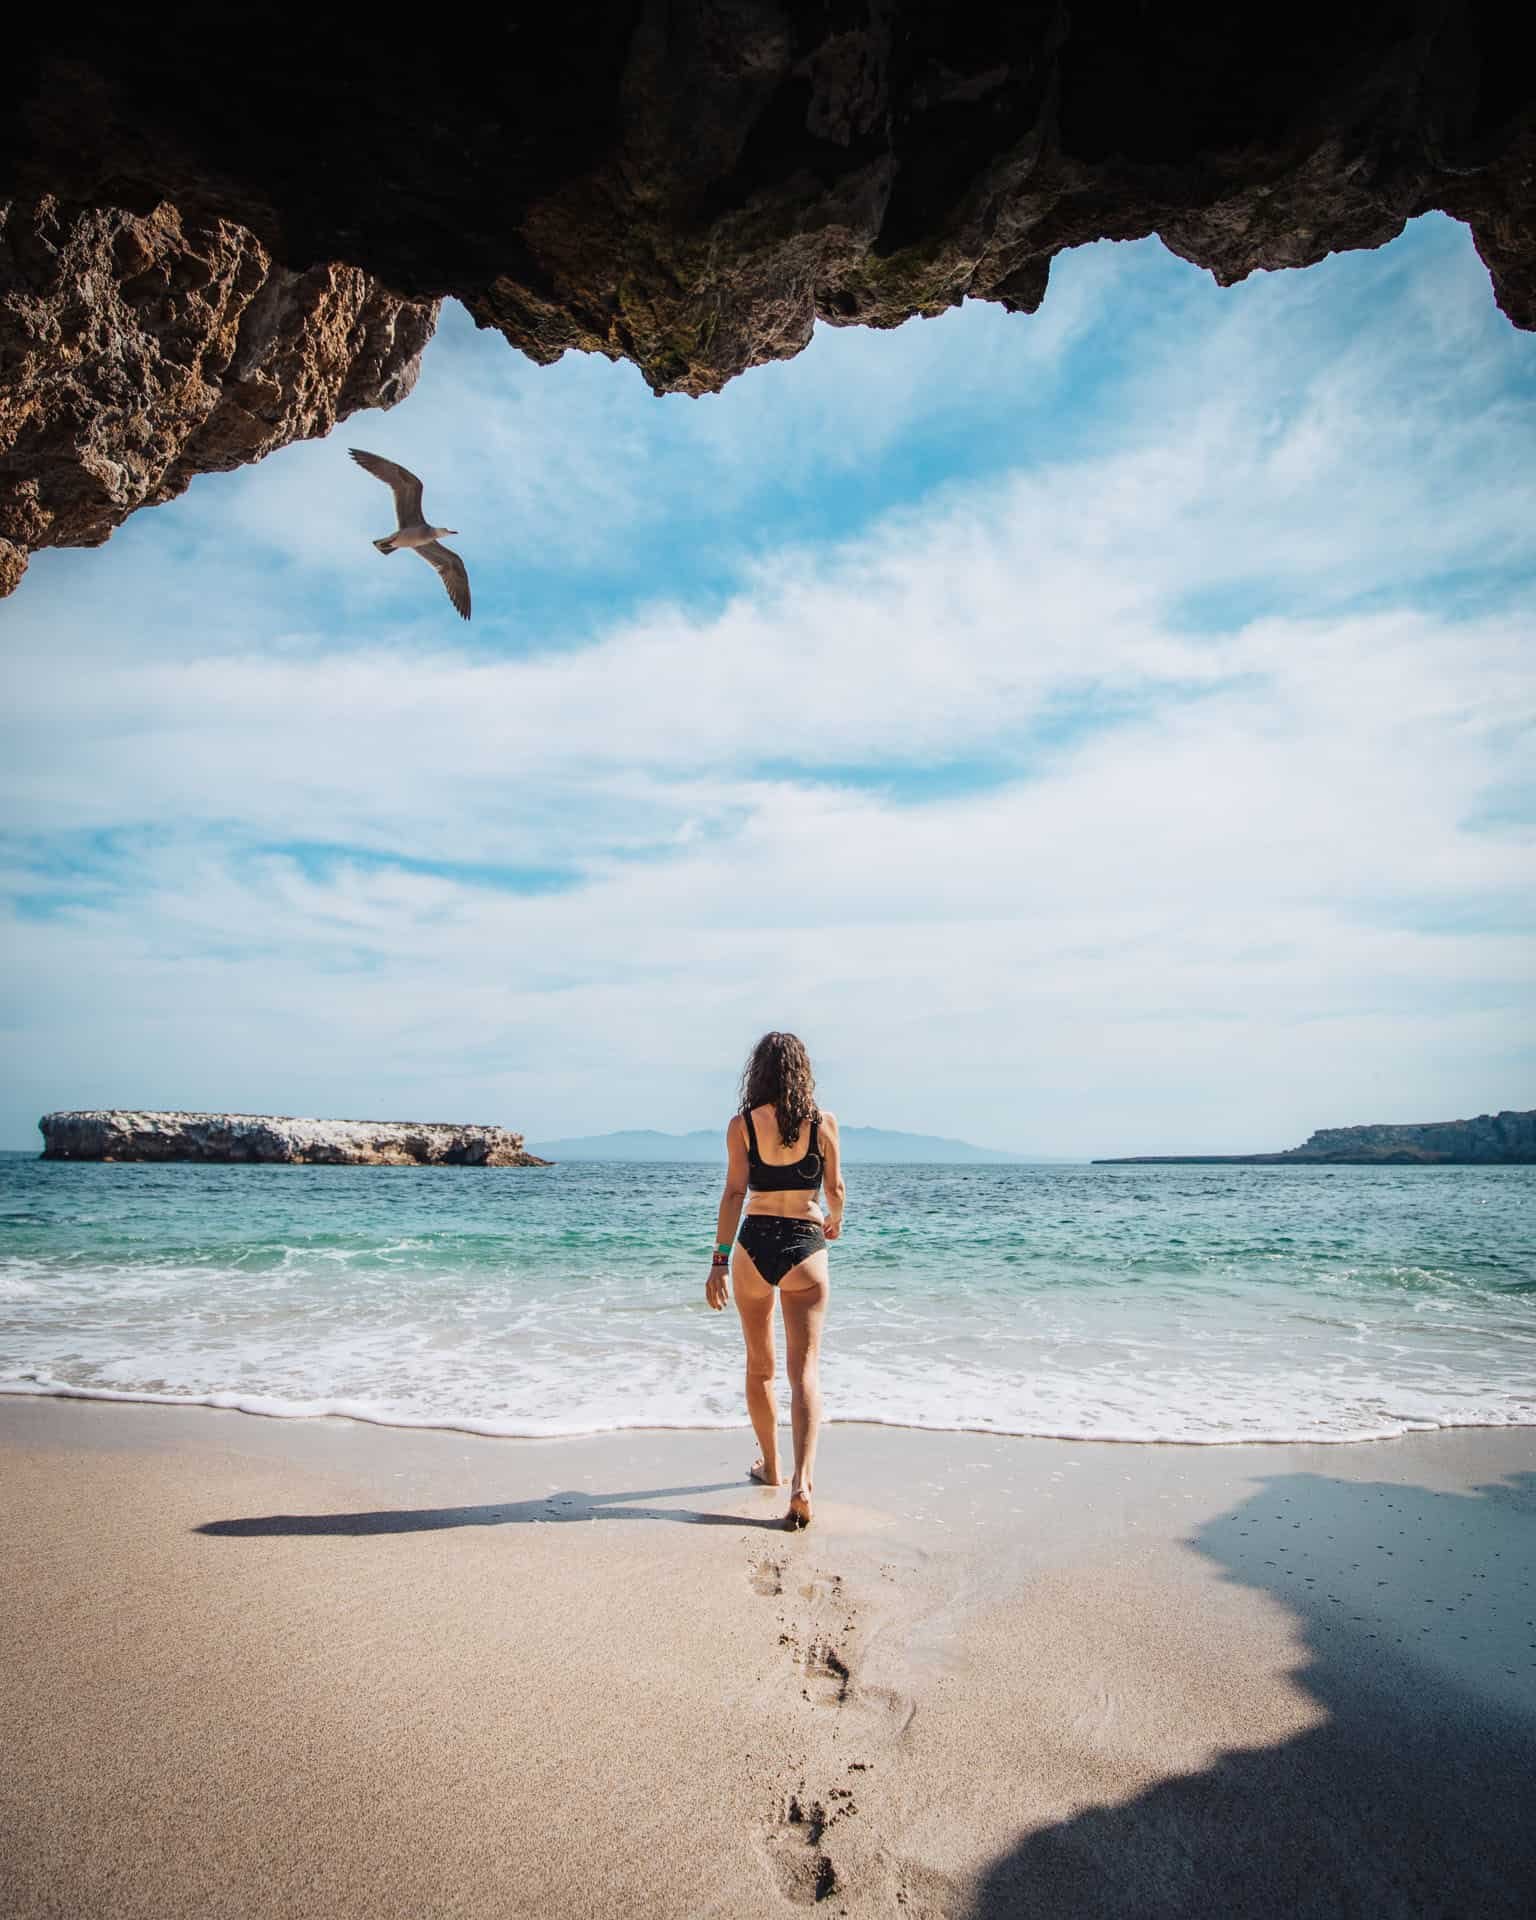 marietas islands, secret beach mexico, things to do in sayulita, sayulita mexico, what to do in sayulita, sayulita